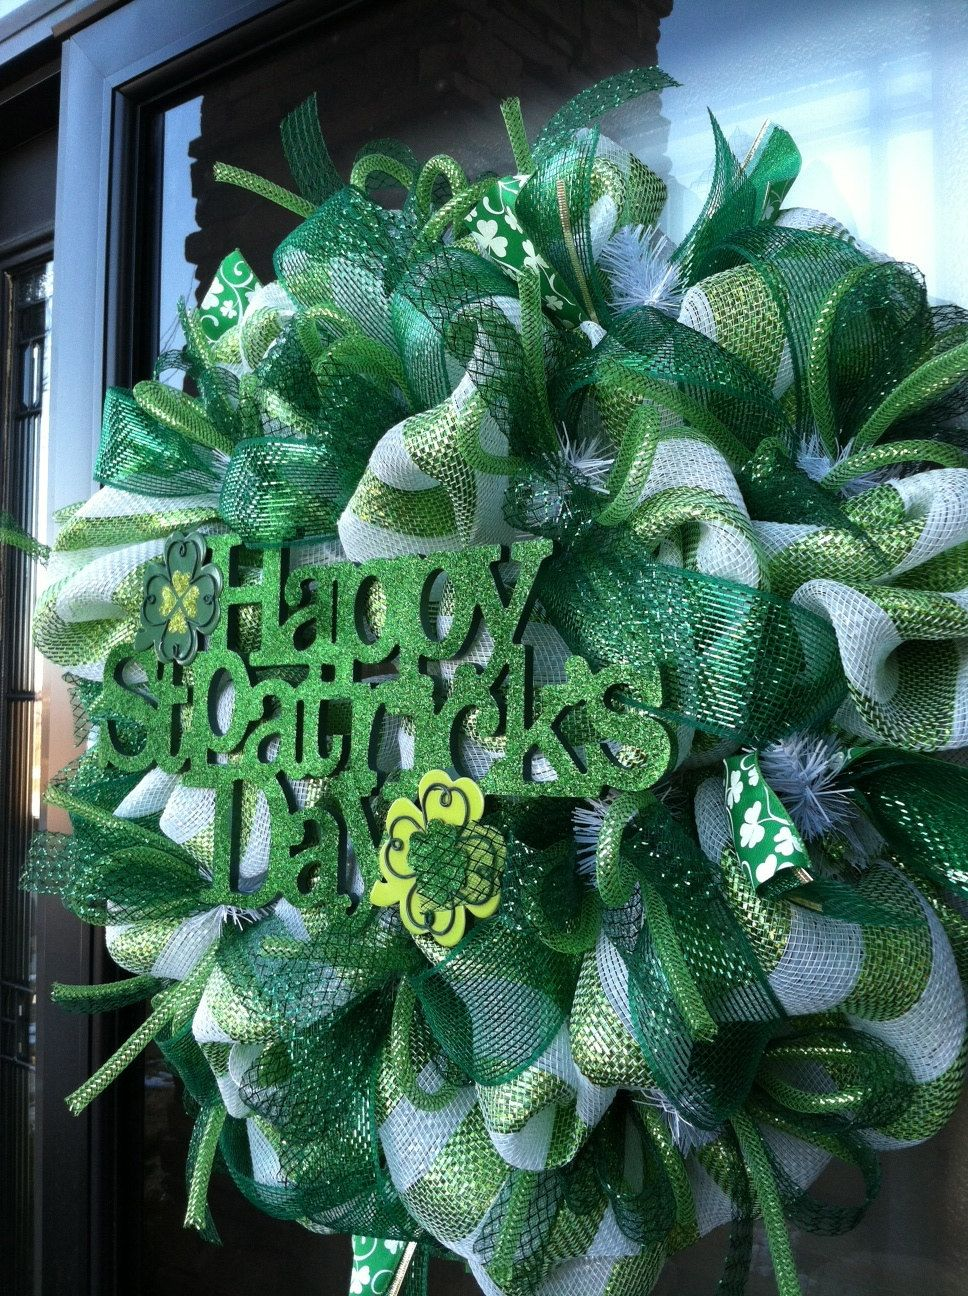 happy st patrick 39 s day deco mesh wreath deco mesh wreaths wreaths deco mesh wreaths mesh. Black Bedroom Furniture Sets. Home Design Ideas